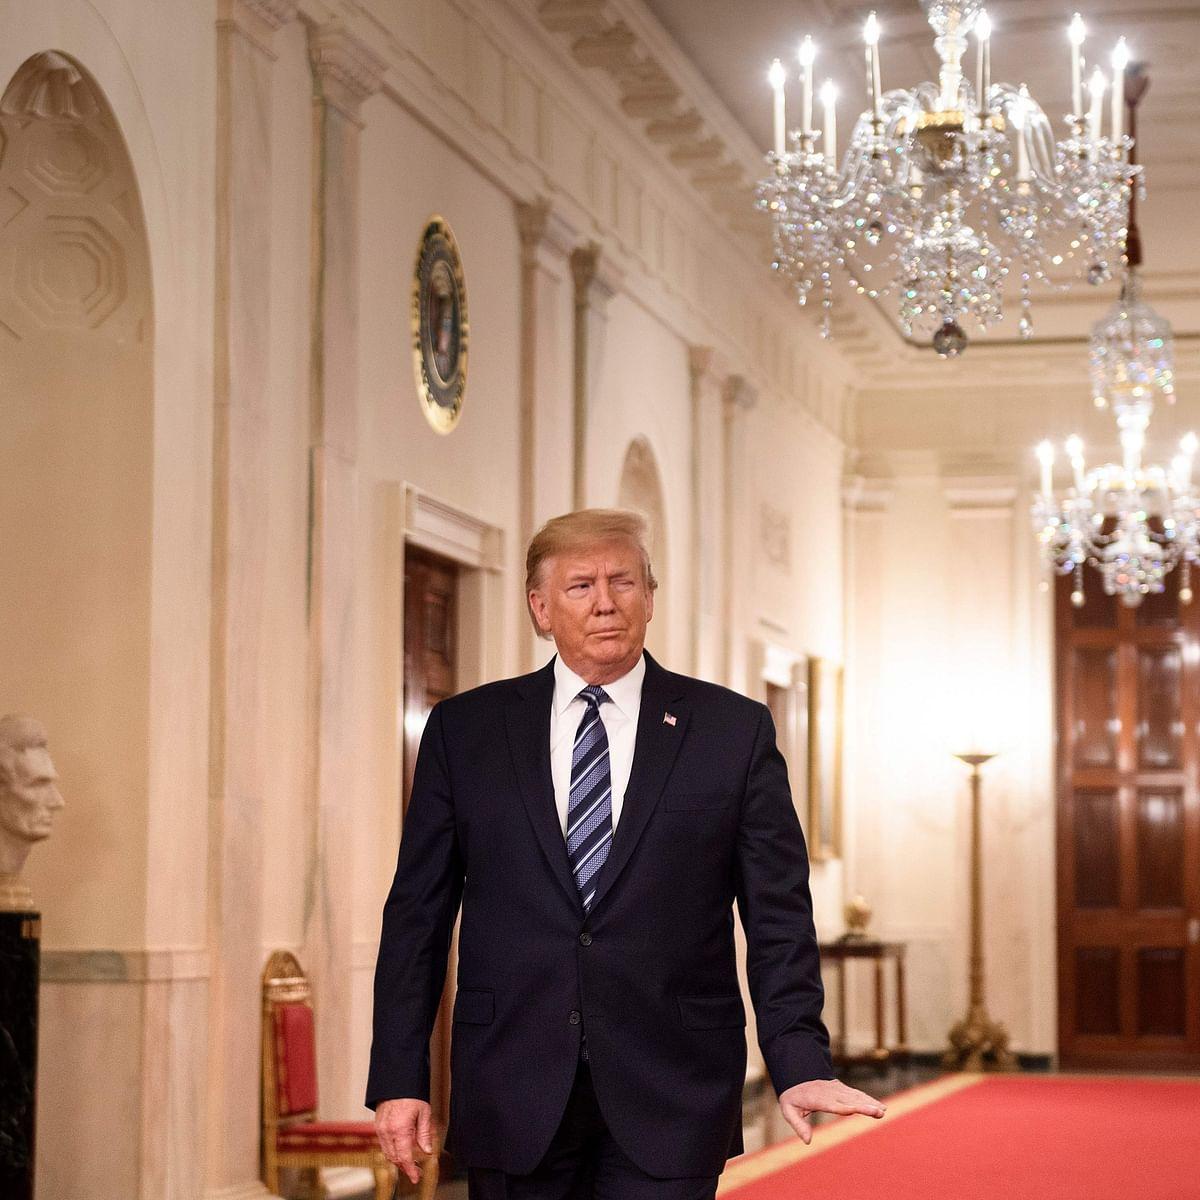 House Speaker Nancy Pelosi announces President Trump's impeachment